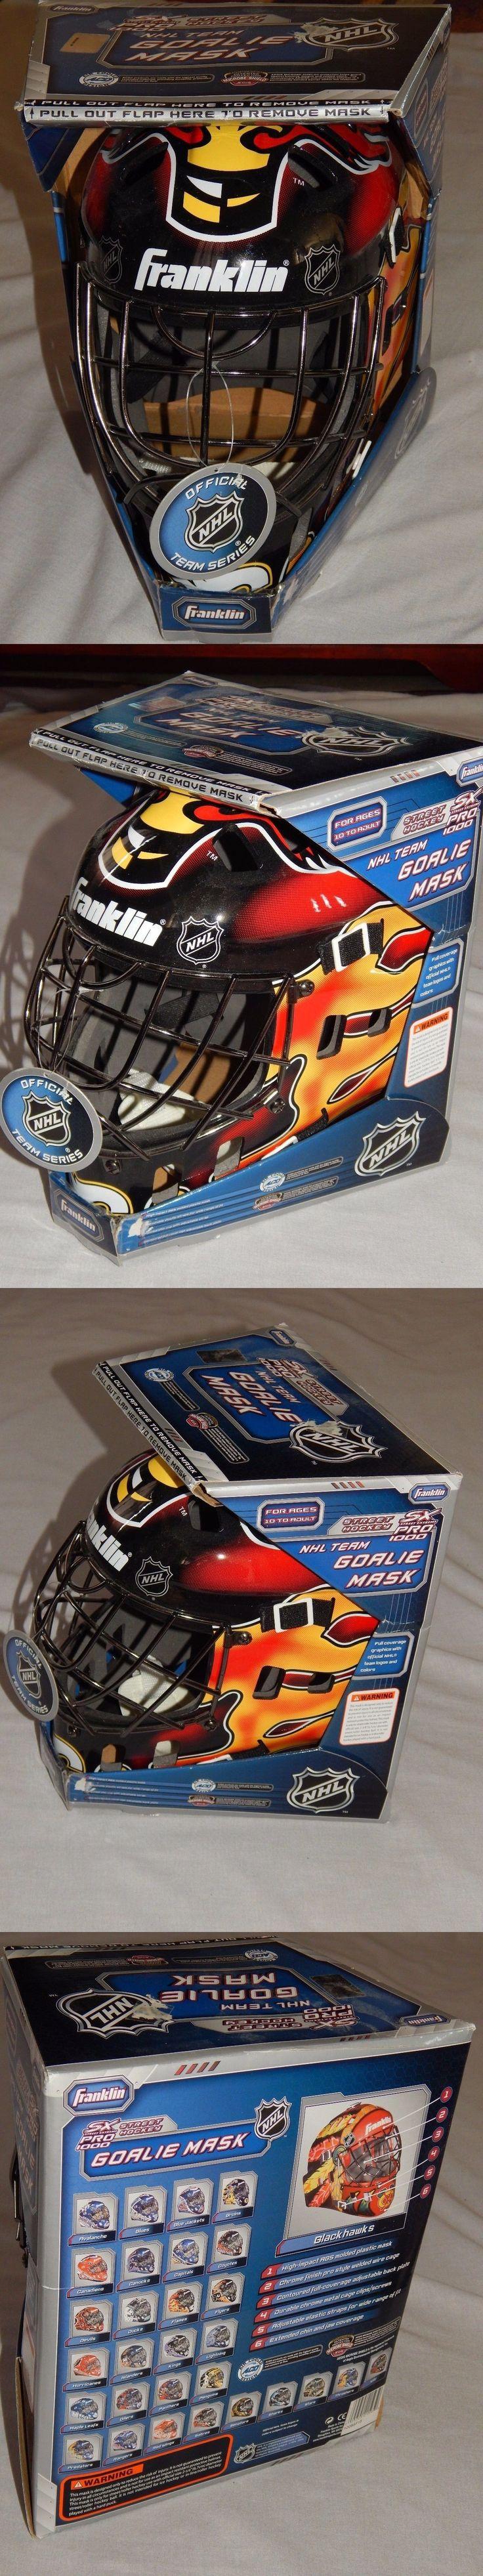 Face Masks 79762: New Calgary Flames Street Hockey Nhl Full Size Goalie Mask Franklin Sx Pro 1000 -> BUY IT NOW ONLY: $59.99 on eBay!